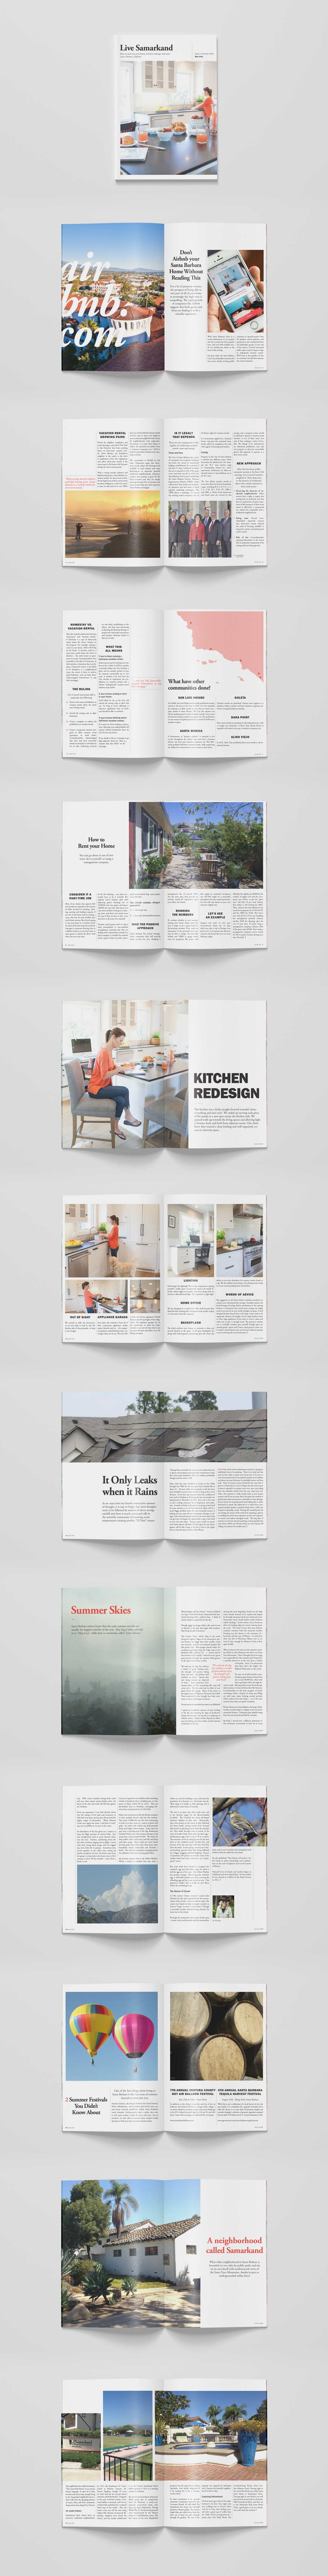 magazine design, santa barbara, samarkand, arterra, residential, real estate